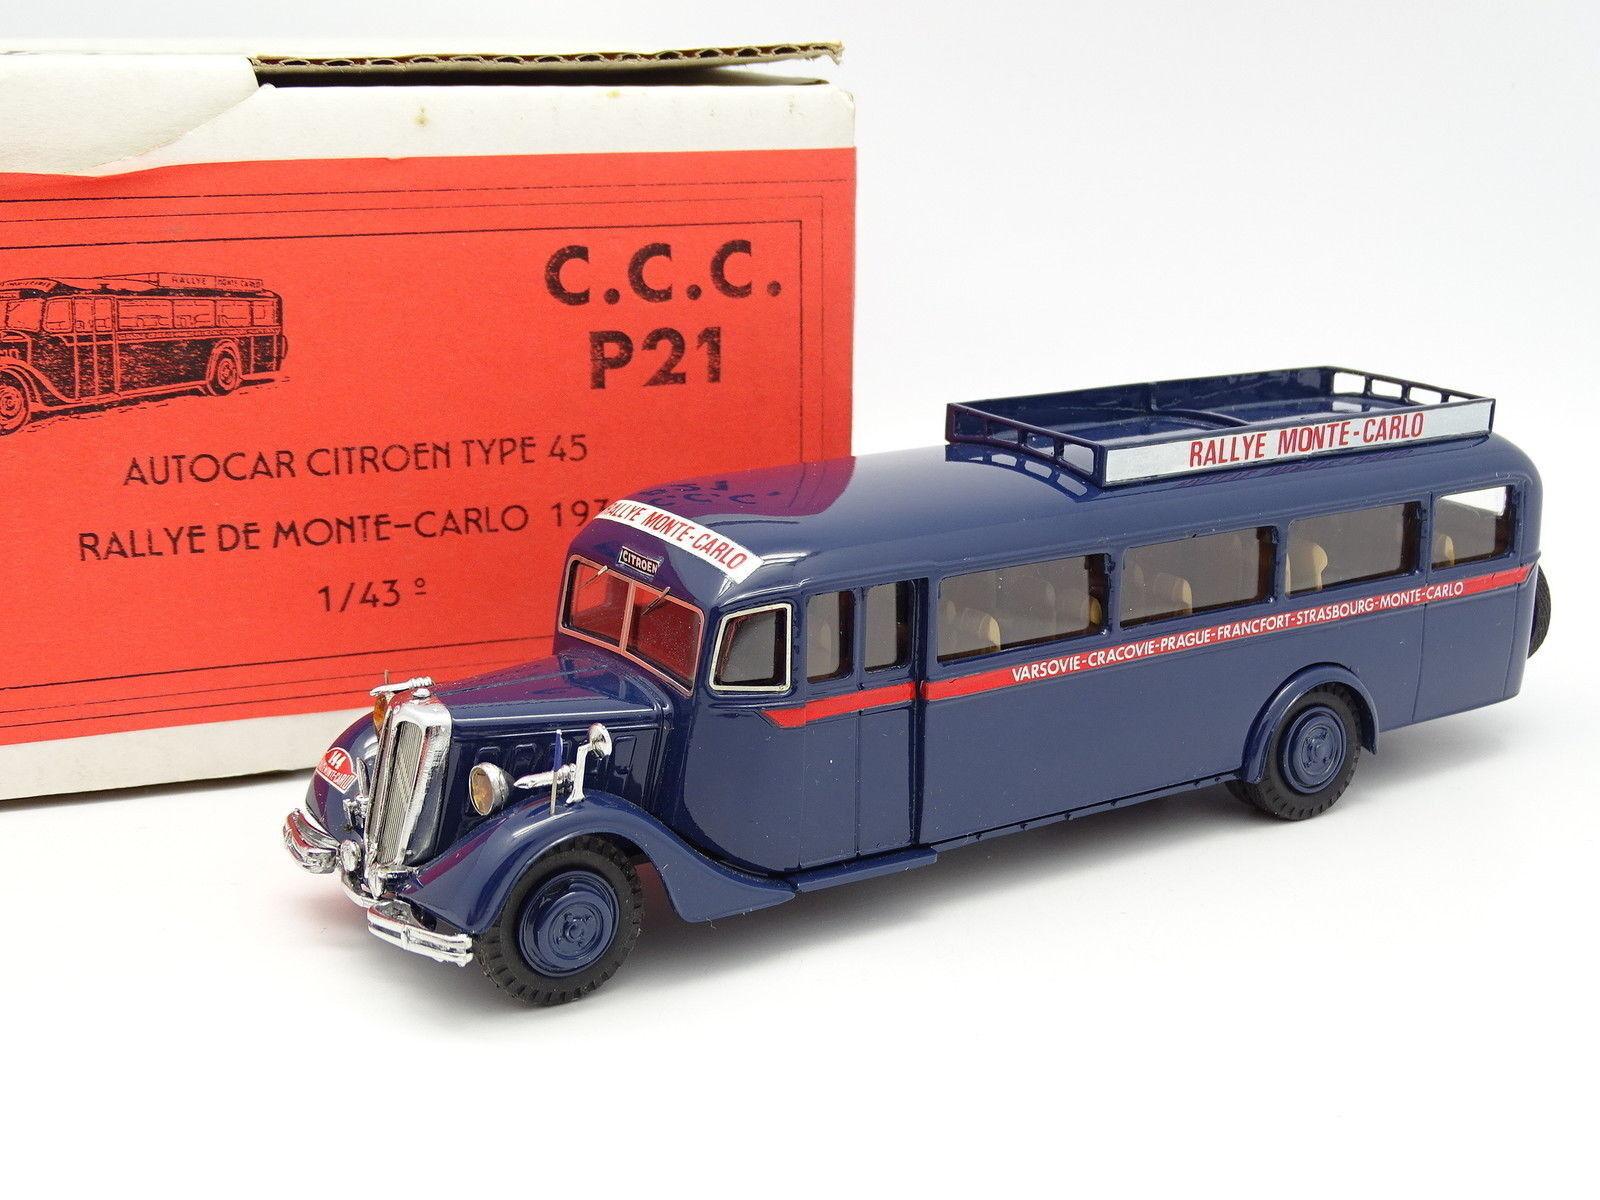 CCC 1 43 - Car Autocar Citroen Type 45 Rallye Monte Carlo 1934